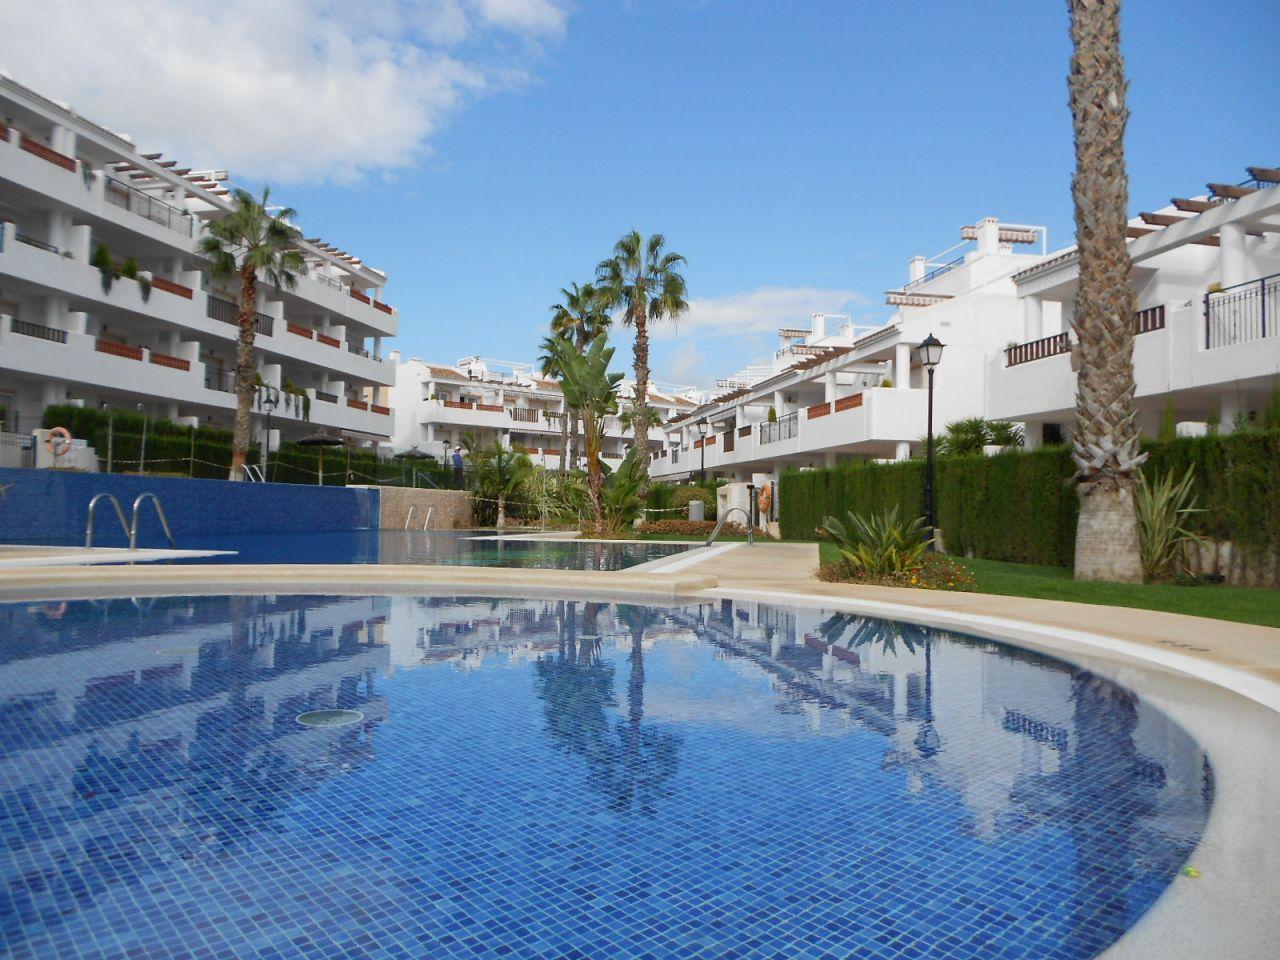 Апартаменты в Ориуэла Коста, Испания, 80 м2 - фото 1